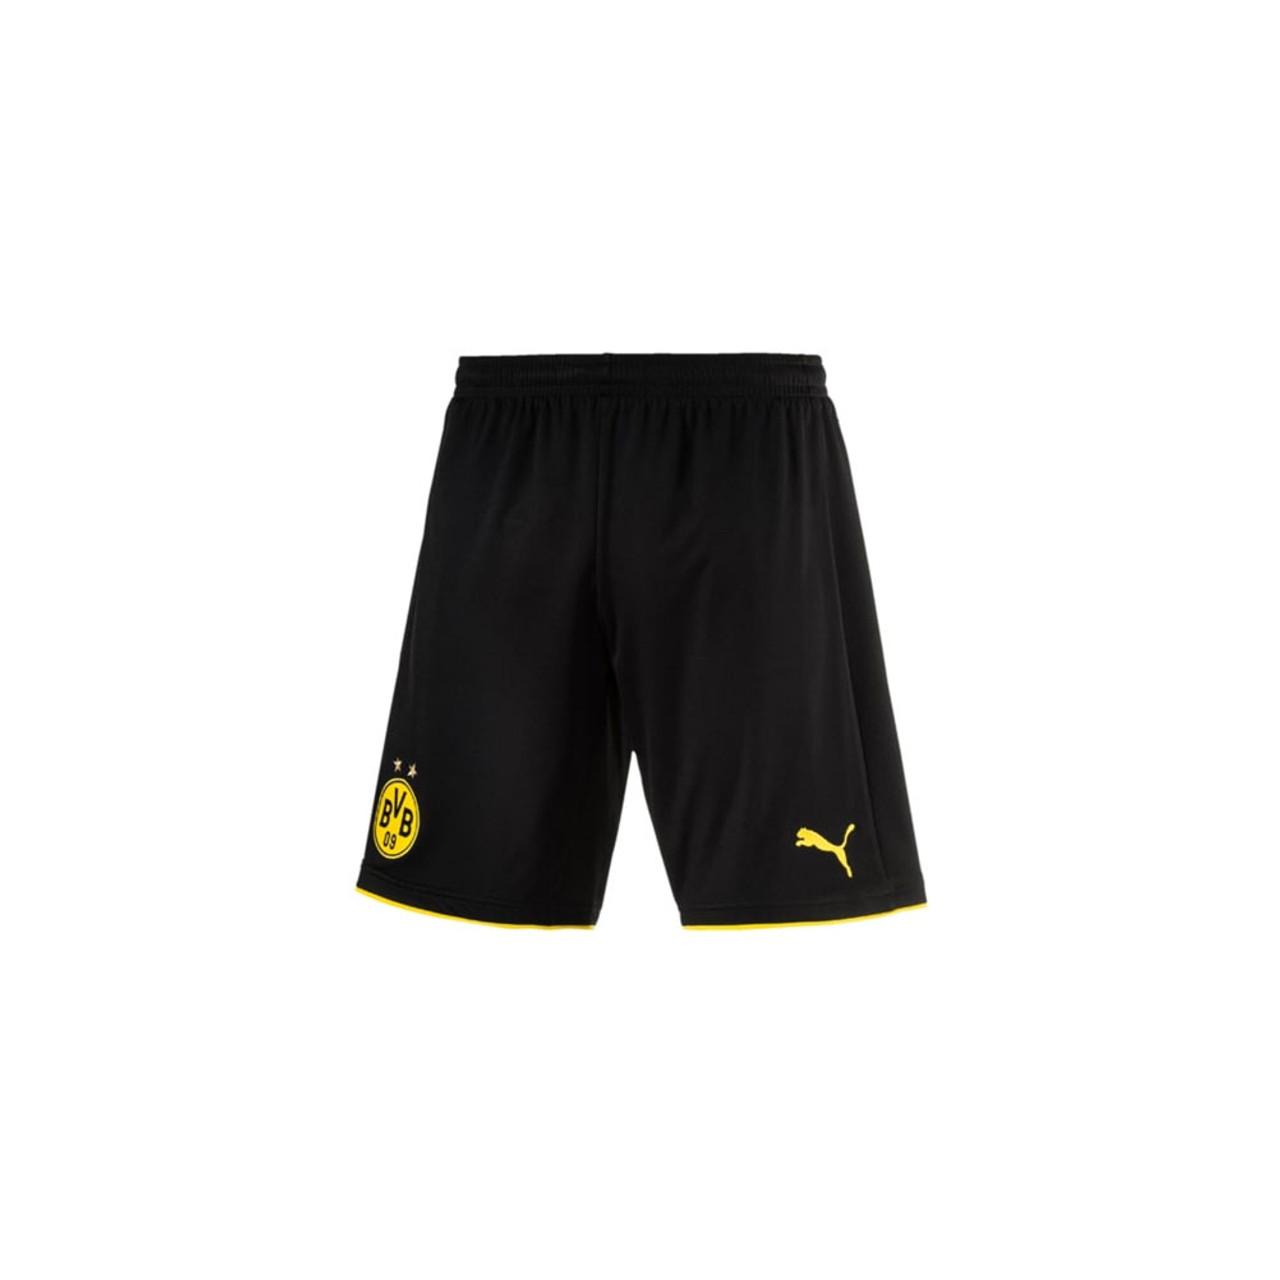 2c6a4b1ba2 PUMA borussia dortmund 2016/17 woven football shorts with pockets and inner  [black]